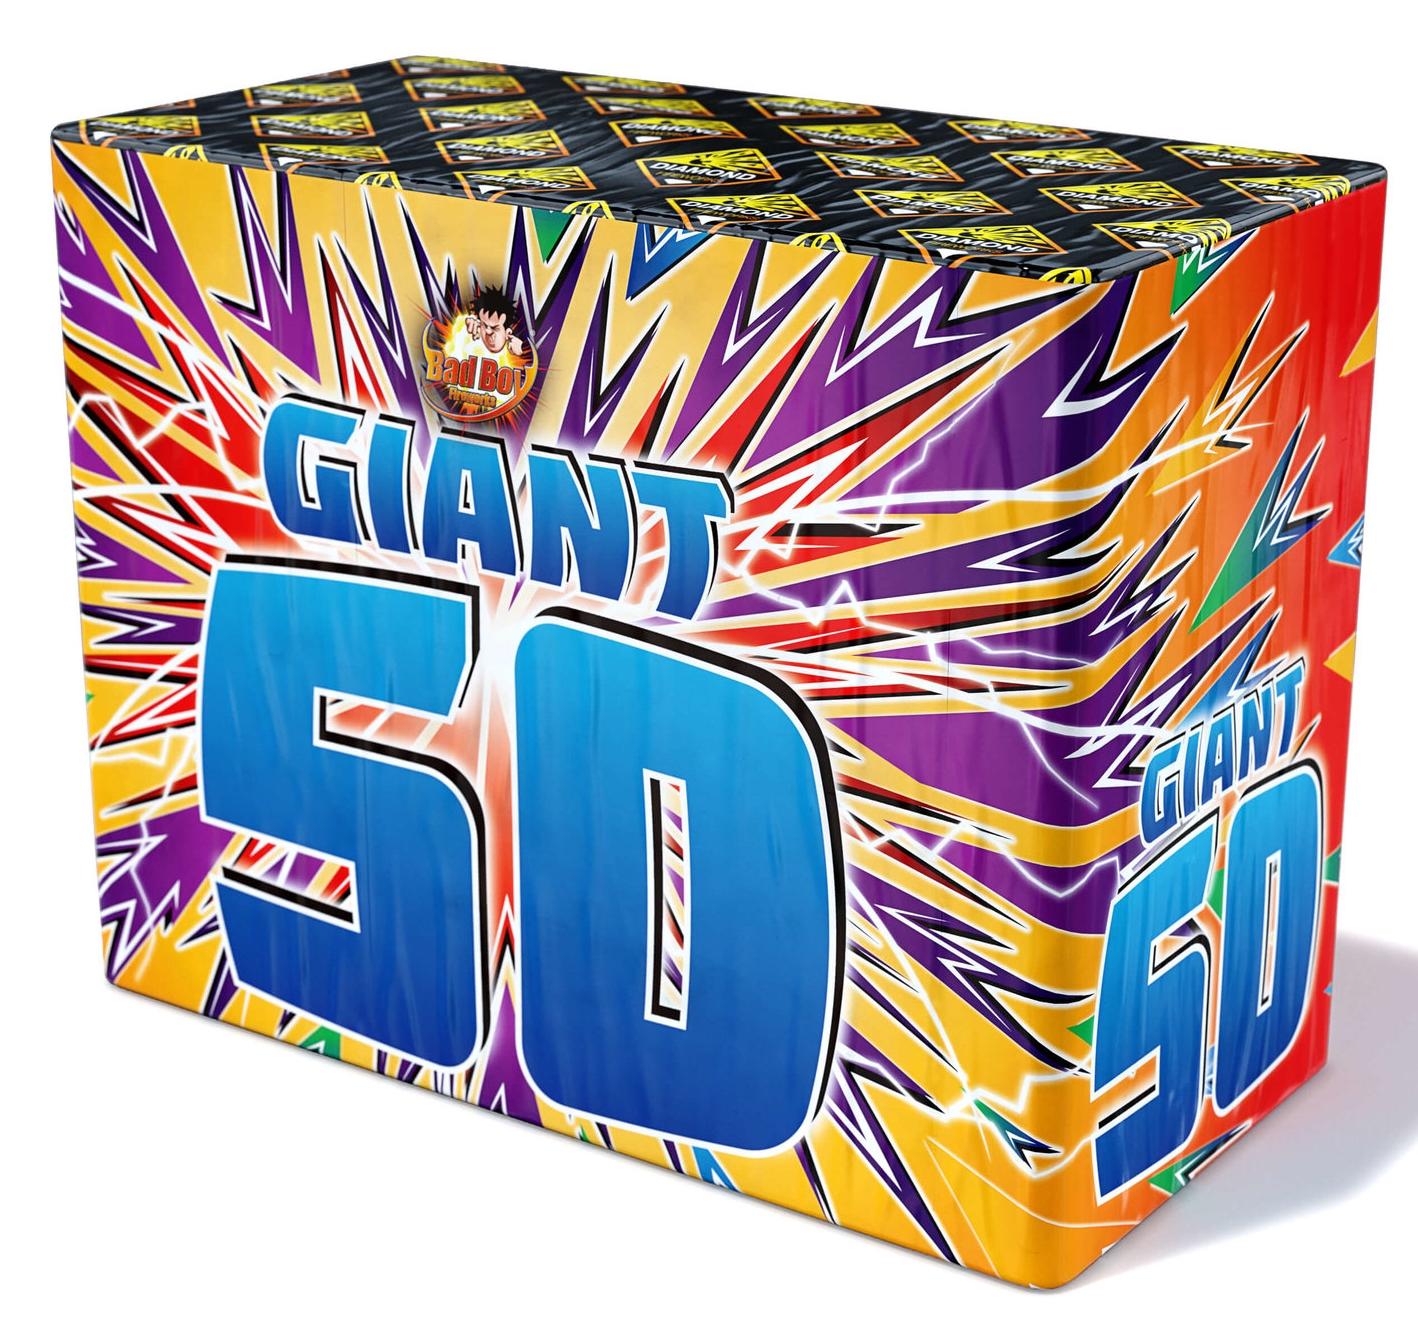 Giant 50 Shot 1.3G - RRP £145.00